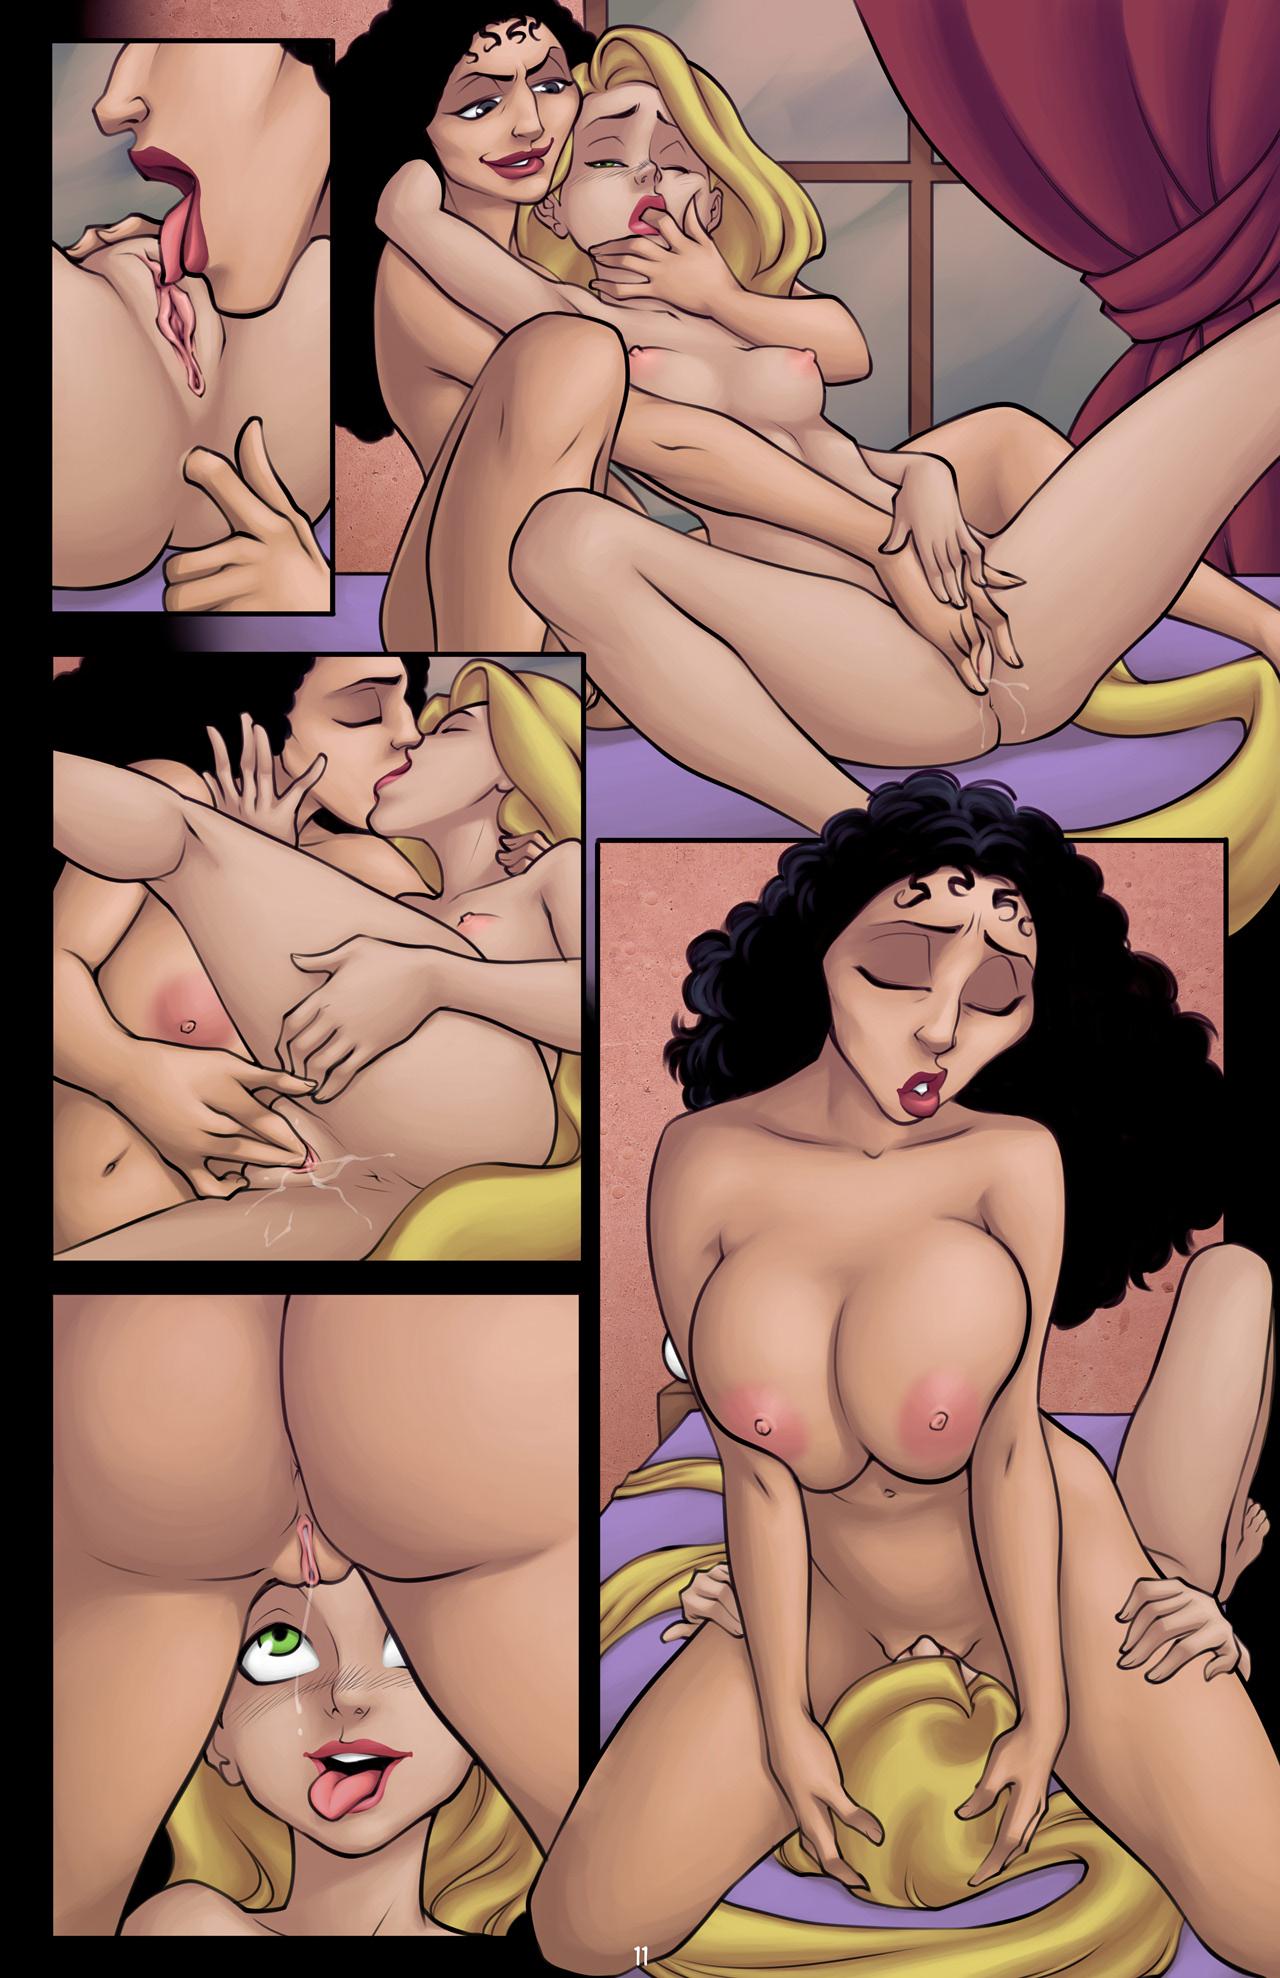 Lesbians Cartoon Sex